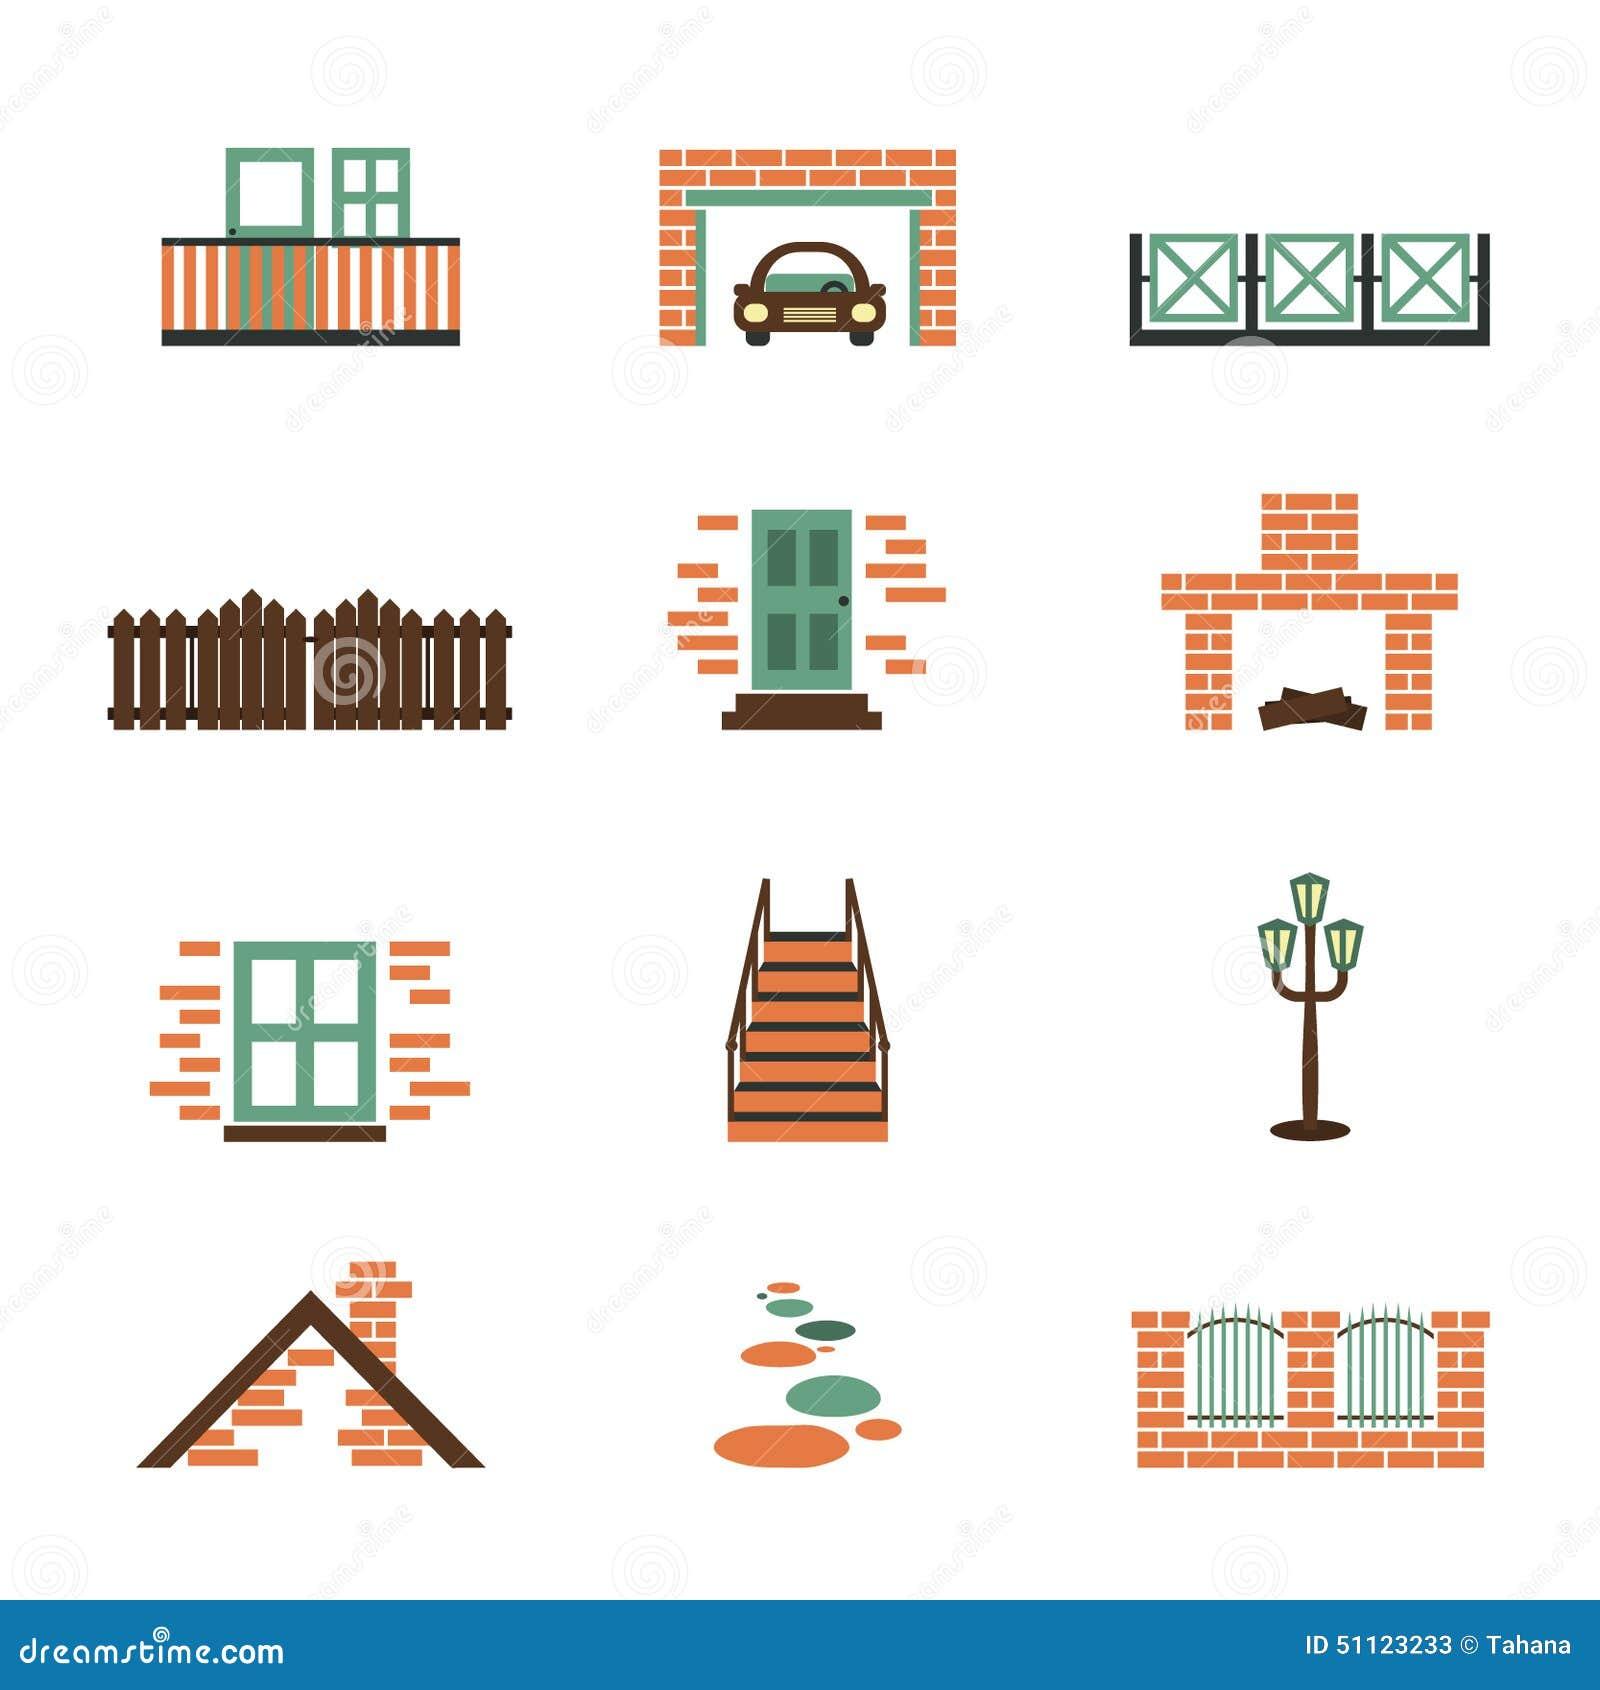 set of house elements isolated stock illustration illustration of Home Decor Elements set of house elements isolated